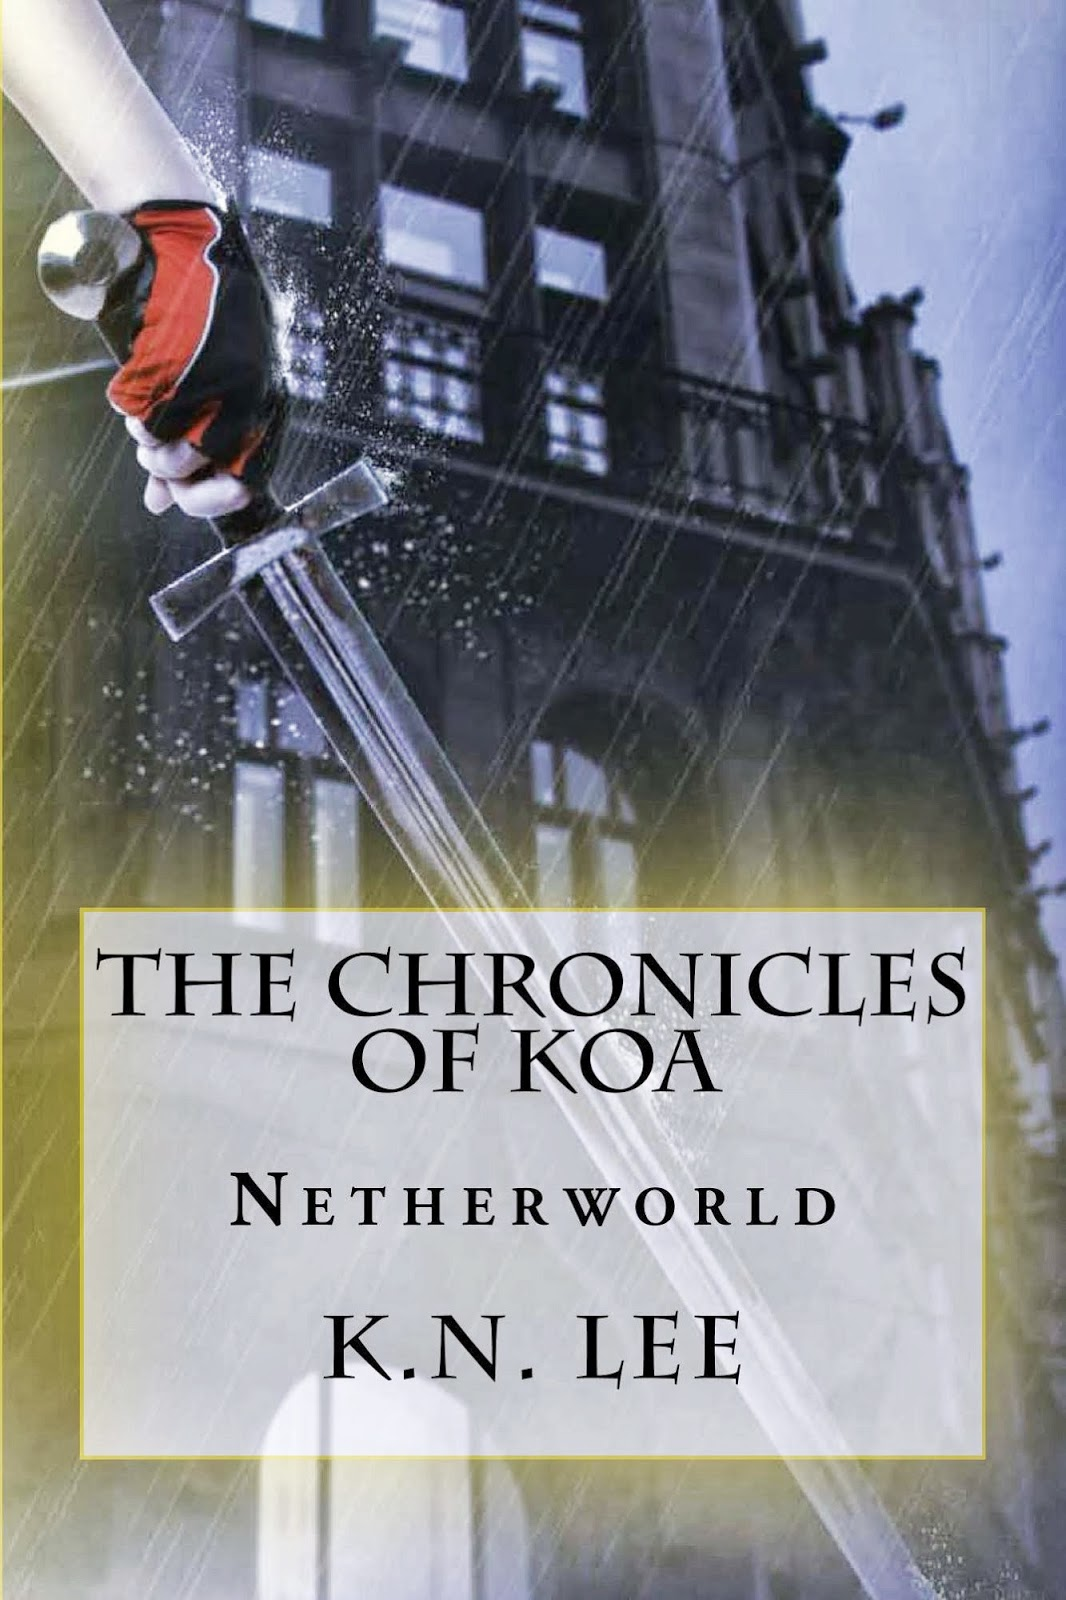 http://www.amazon.com/Chronicles-Koa-Netherworld-K-N-Lee-ebook/dp/B00CR0T5KW/ref=tmm_kin_swatch_0?_encoding=UTF8&sr=1-1&qid=1387846589